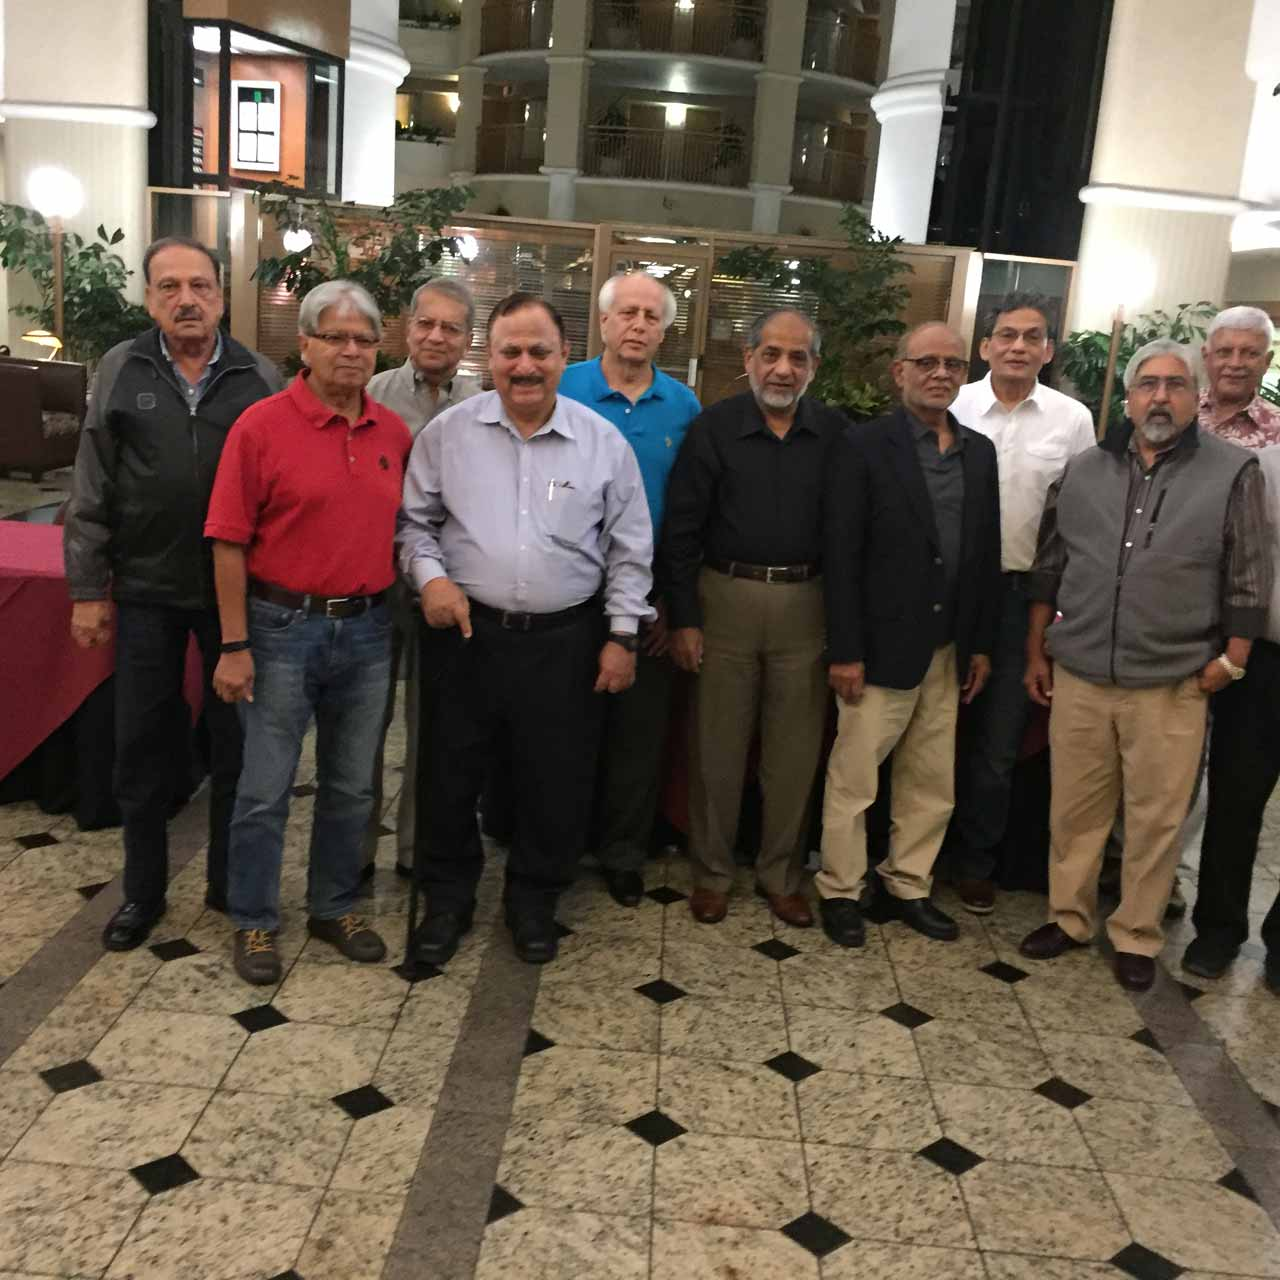 Umar Vawda, Adeel Lari, Tariq Siddiqui, Suhail Qureshi, Shahnawaz Ahmad, Khalid Mushtaq, M. Wajahat Siddiqui, Shamshad Ahmed, Khalid Razzaki, Moin Khan